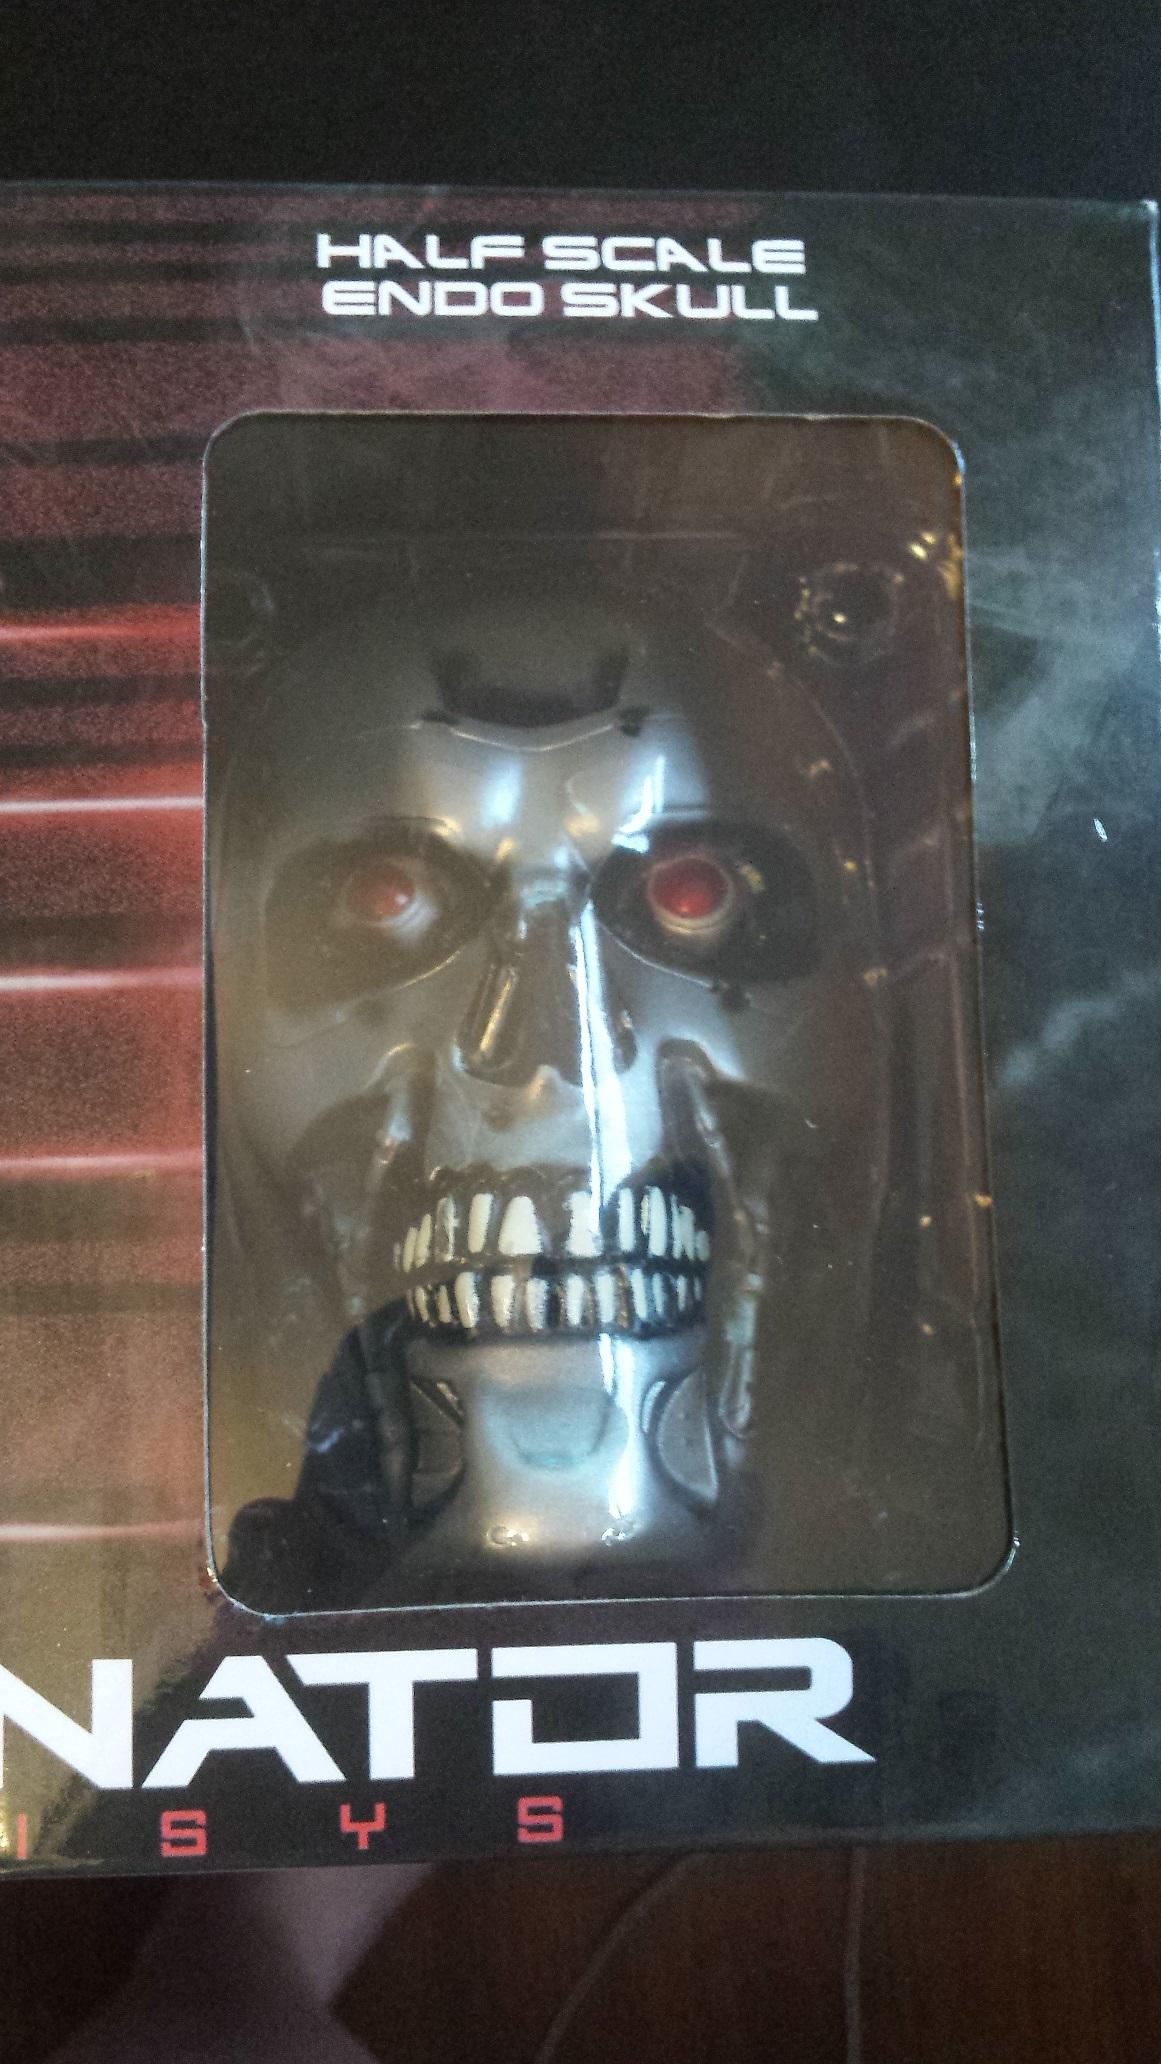 Half scale endo skull terminator genisys